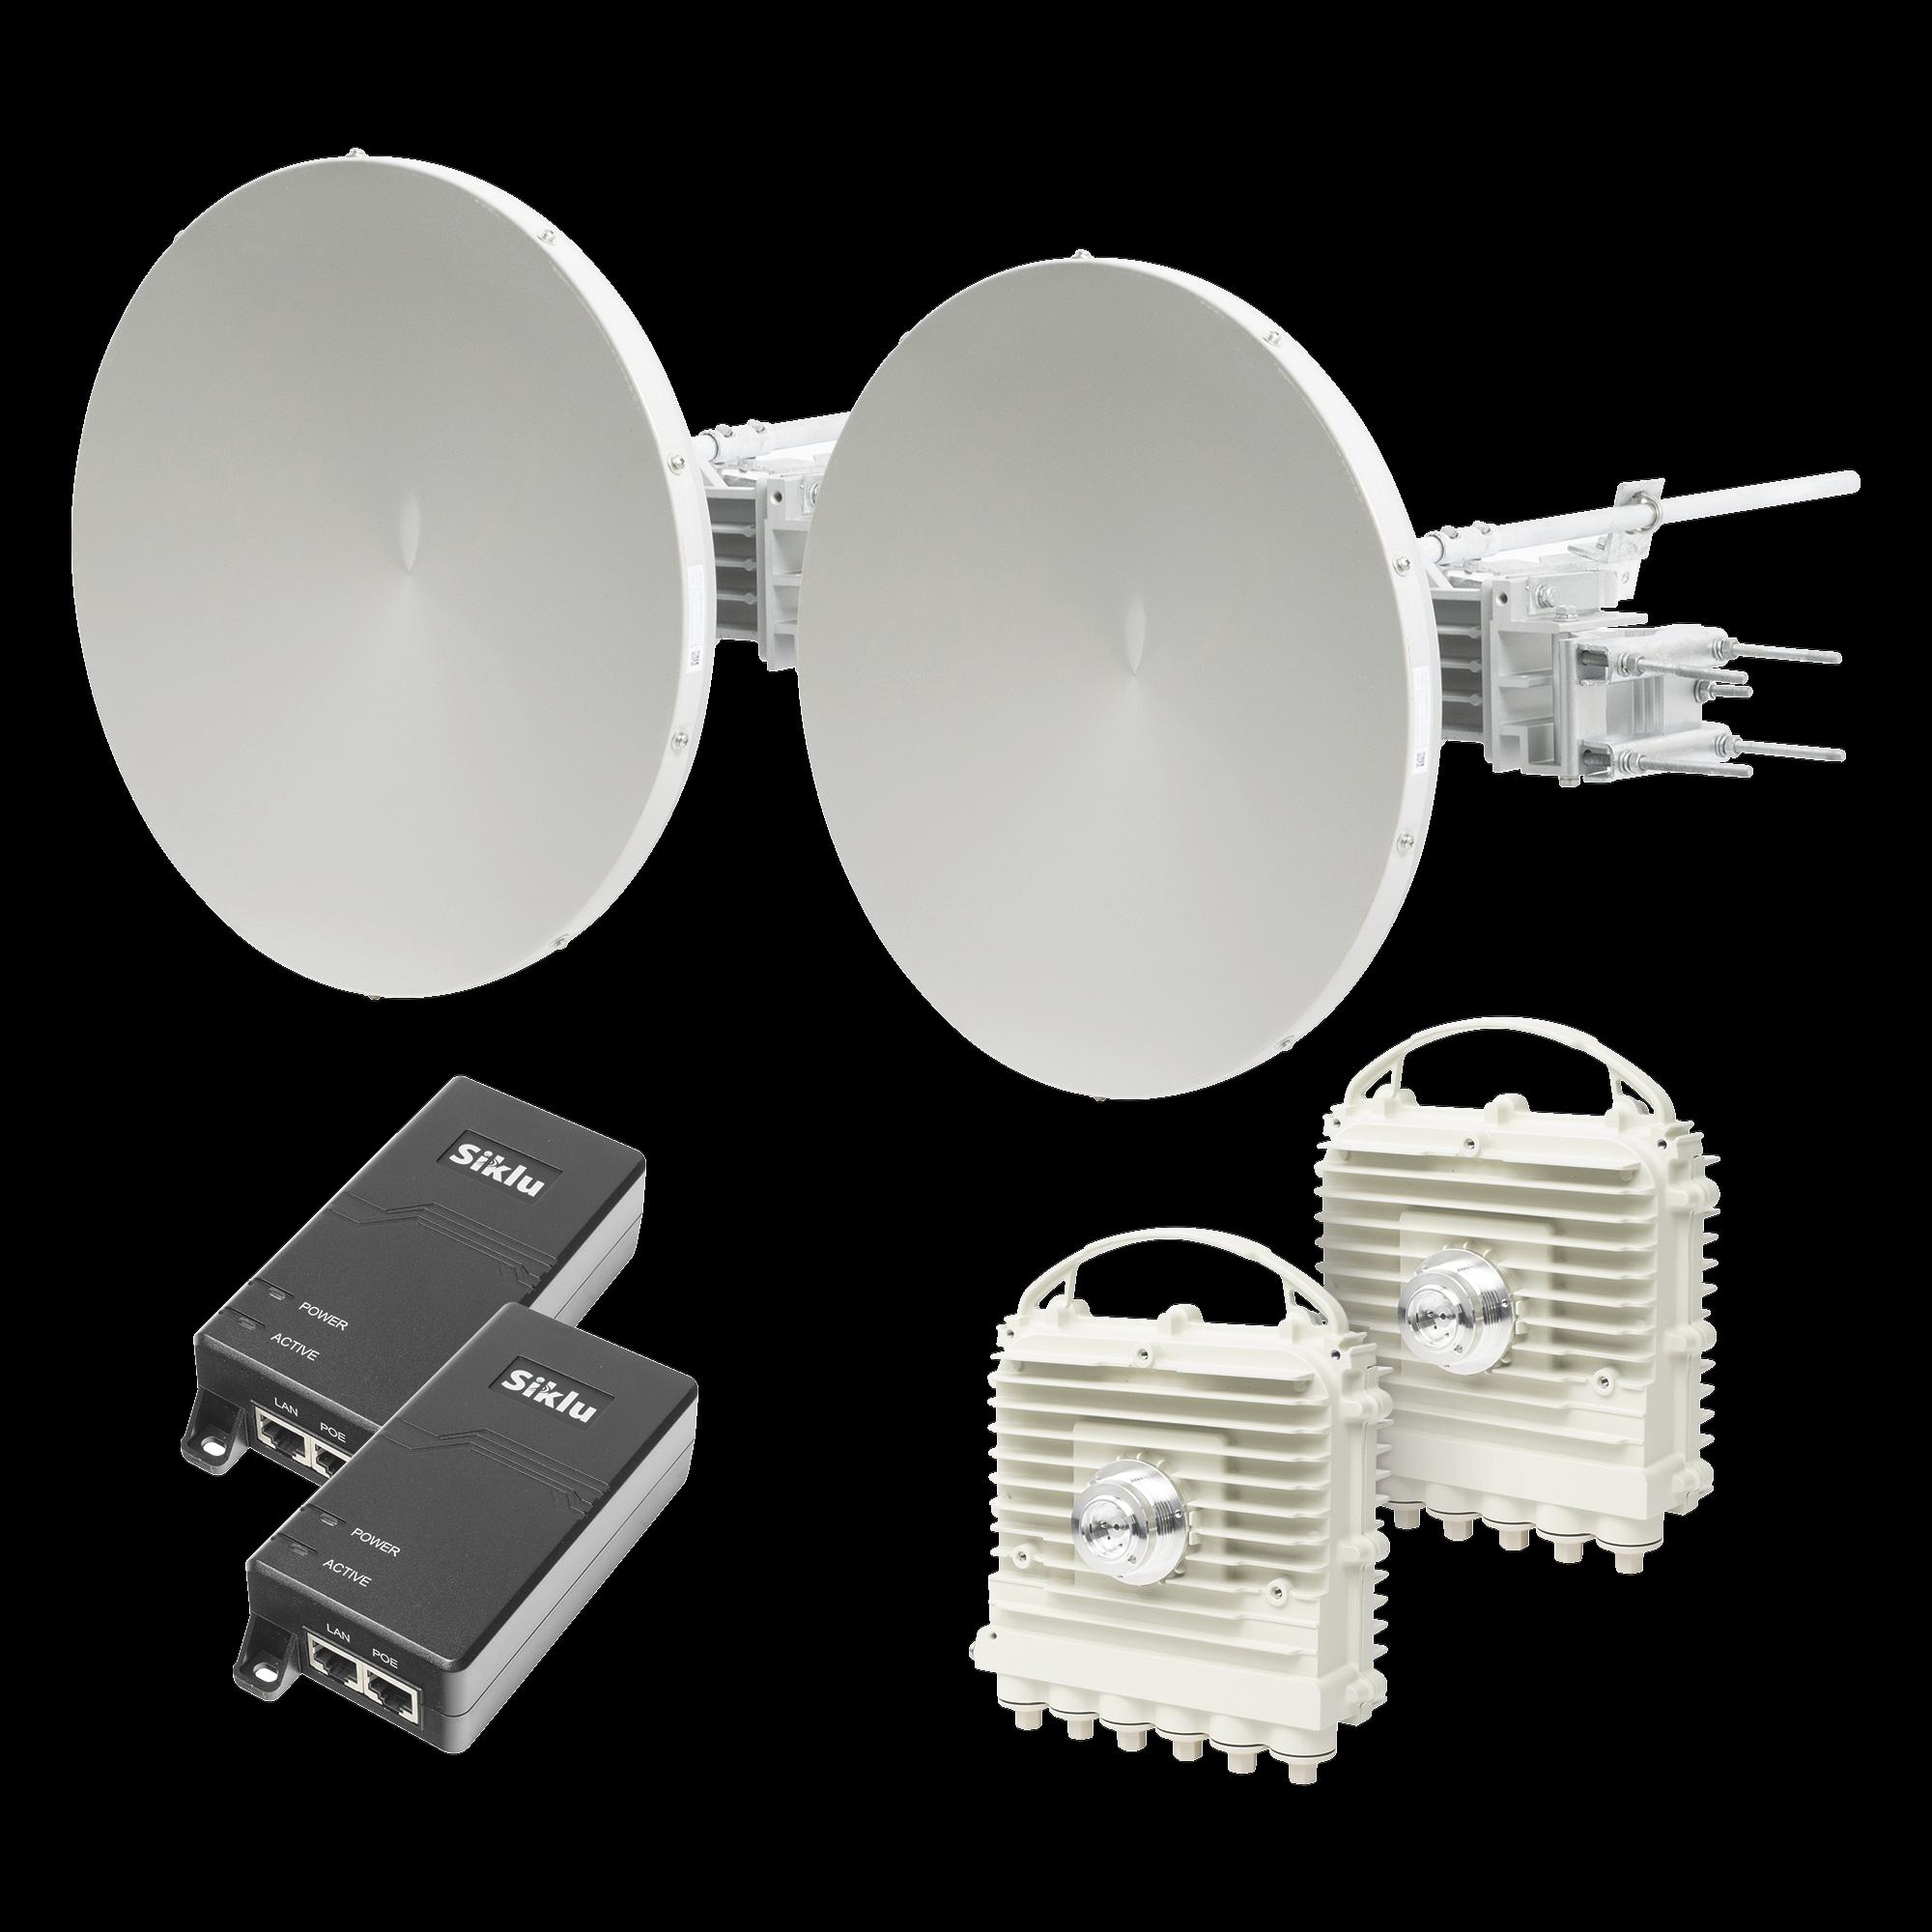 Enlace de Backhaul Completo Serie Kilo-EherHaul? EH-2500FX, Antenas de 2 ft, hasta 2 Gbps reales Full Duplex - Banda Libre en México